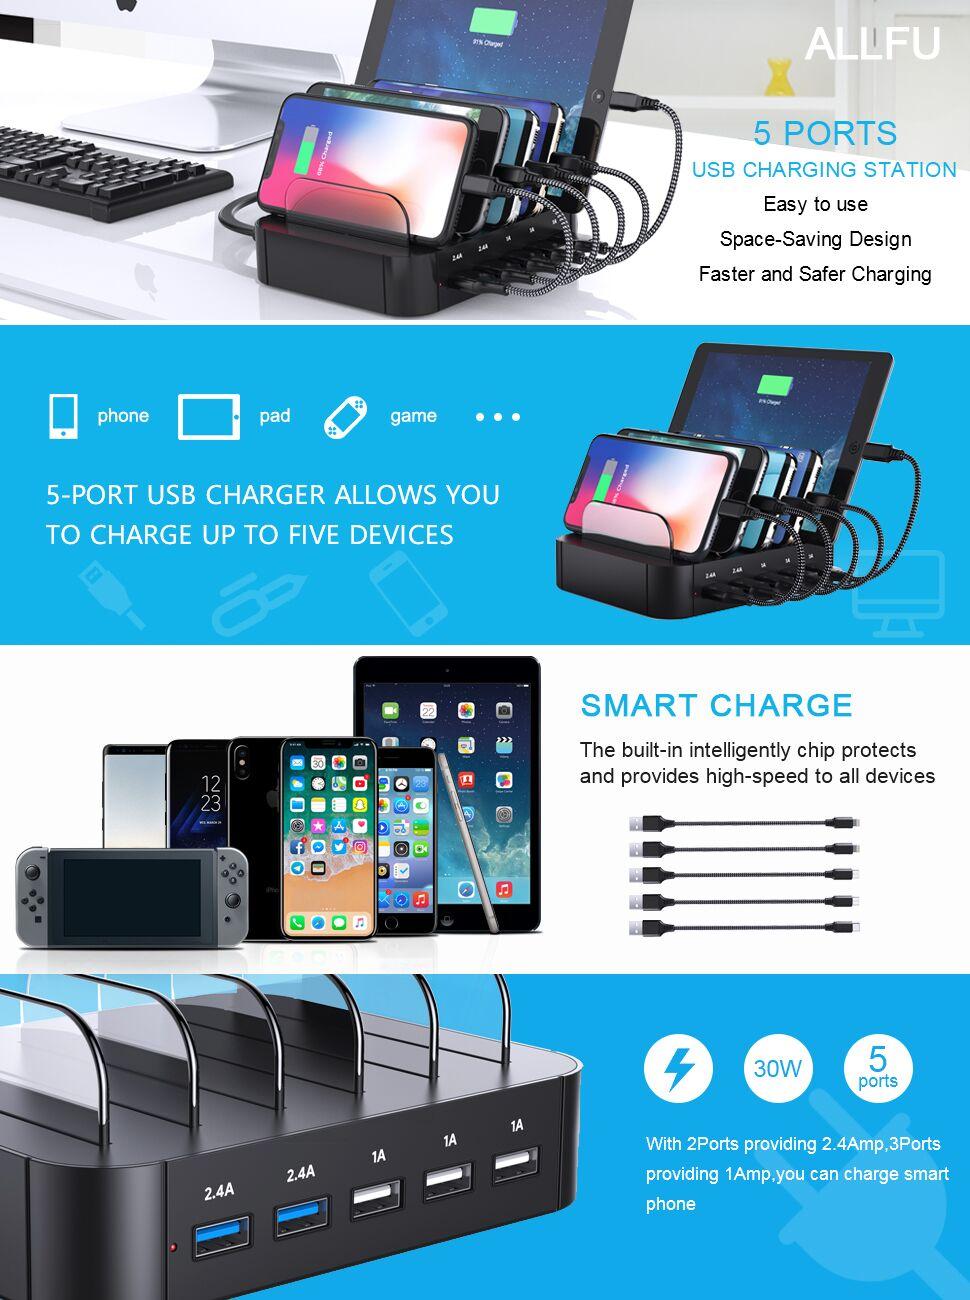 Amazon.com: Charging Station,USB Charging Station Dock ALLFU 5-Port ...